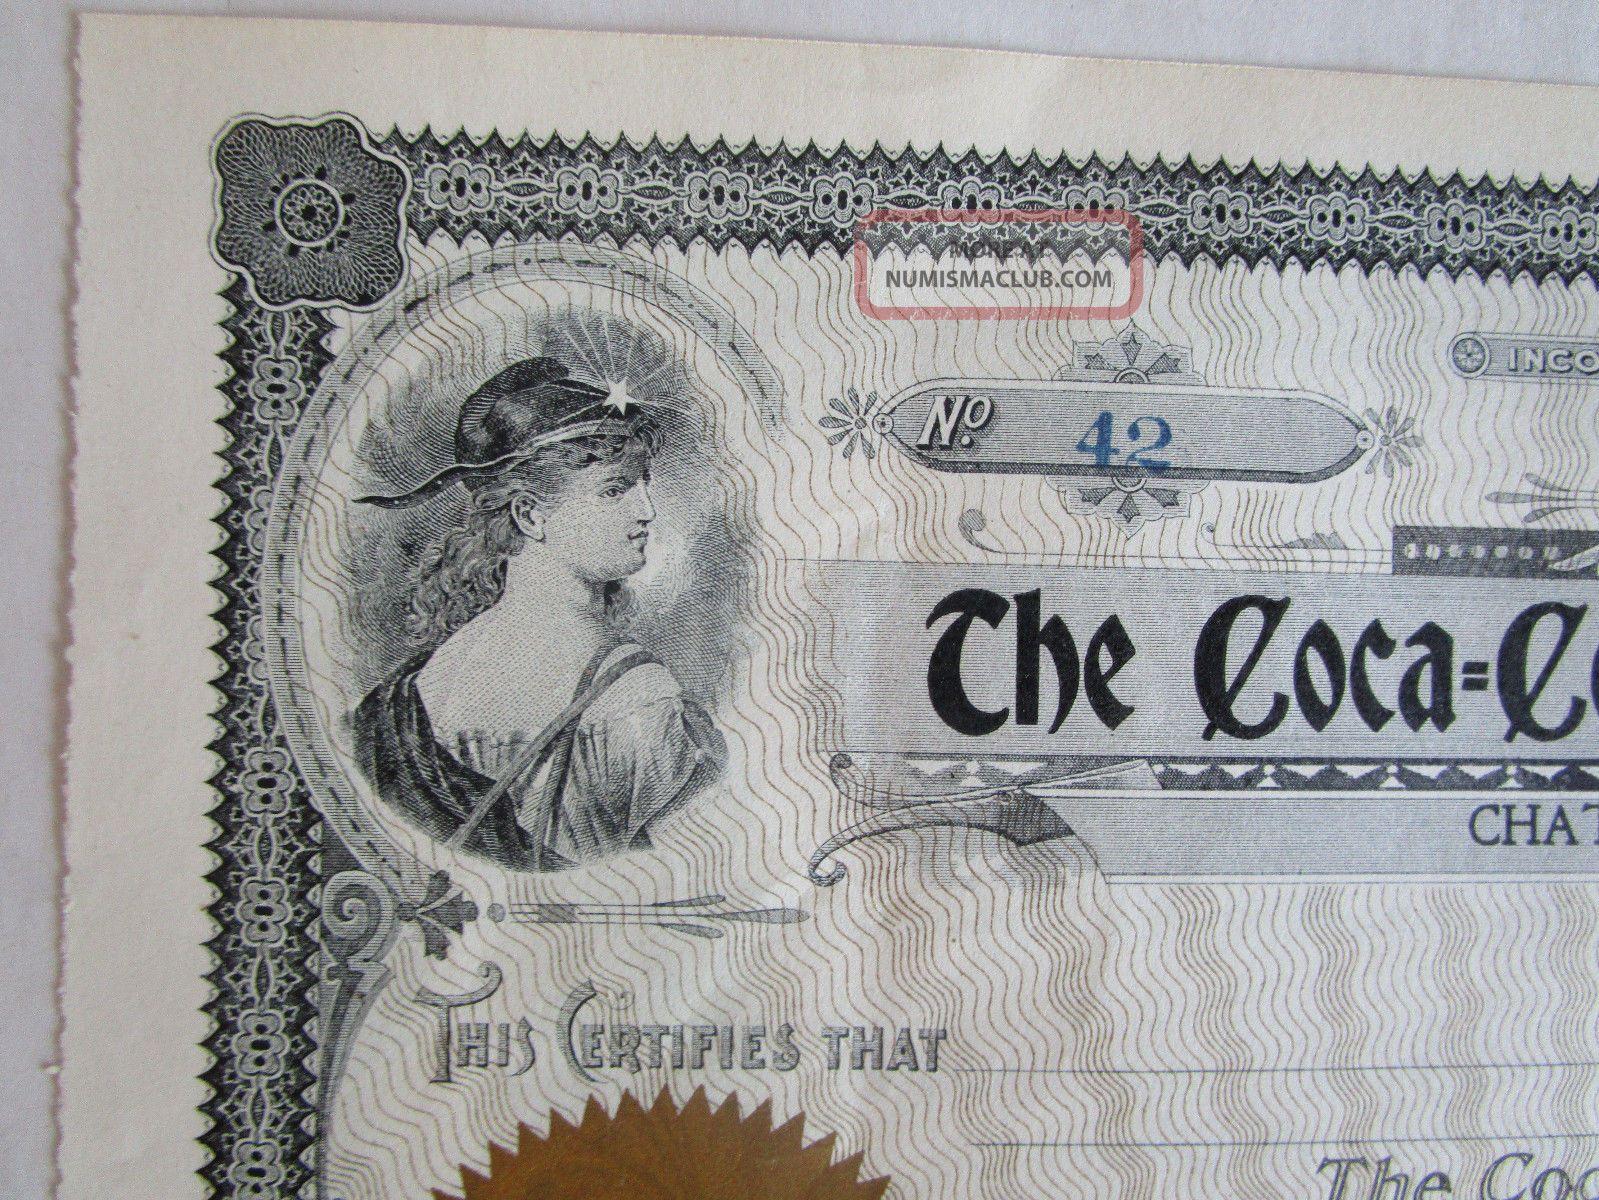 The Coca - Cola Bottling Stock Certificate 42 Chattanooga,  Tn Stocks & Bonds, Scripophily photo